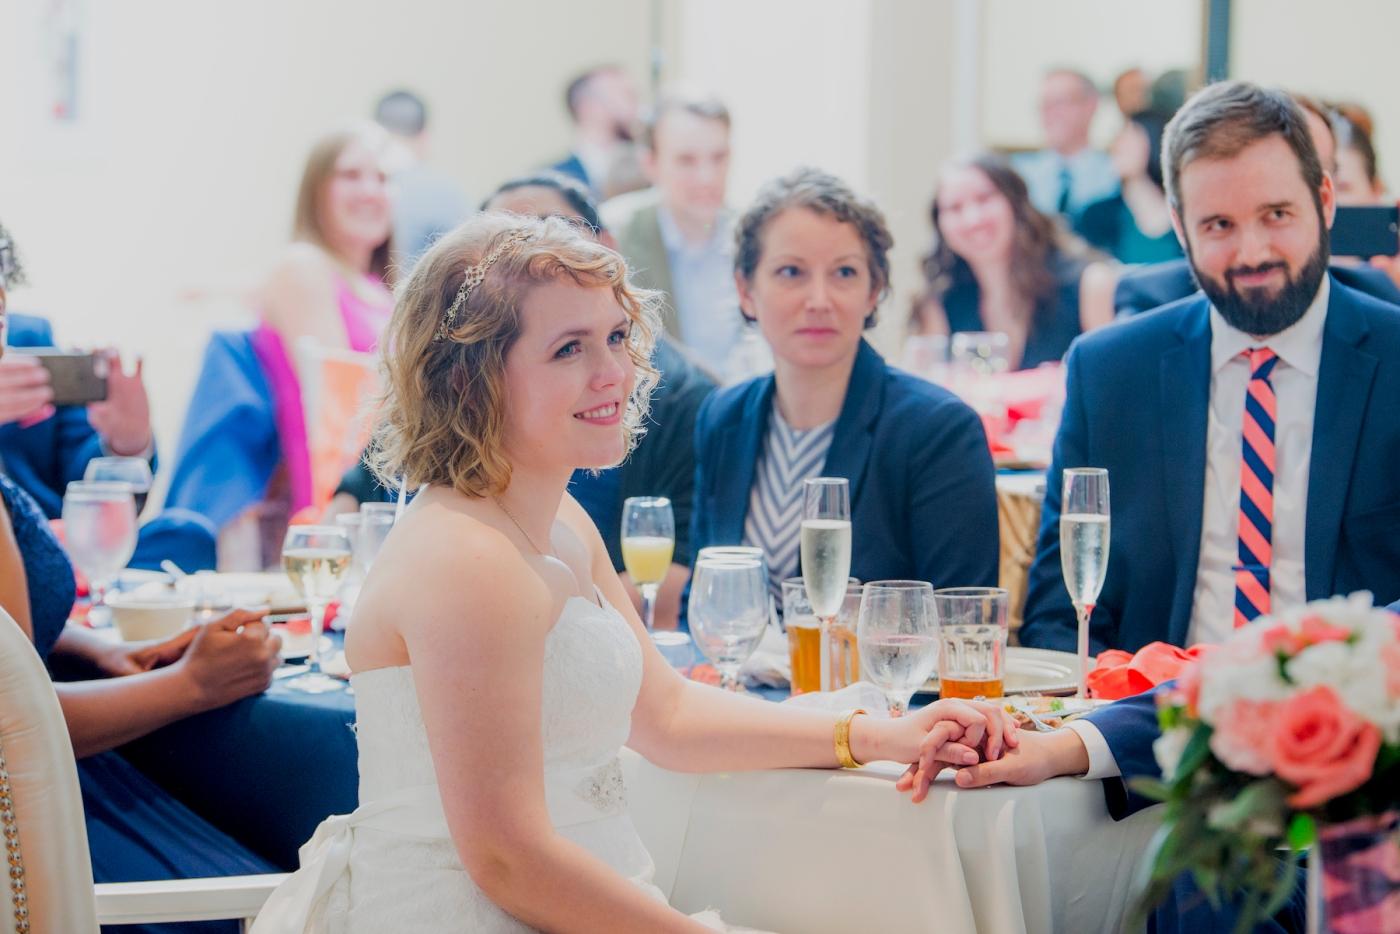 DSC_3237Everett_Wedding_Ballroom_Jane_Speleers_photography_Rachel_and_Edmund_reception_2017